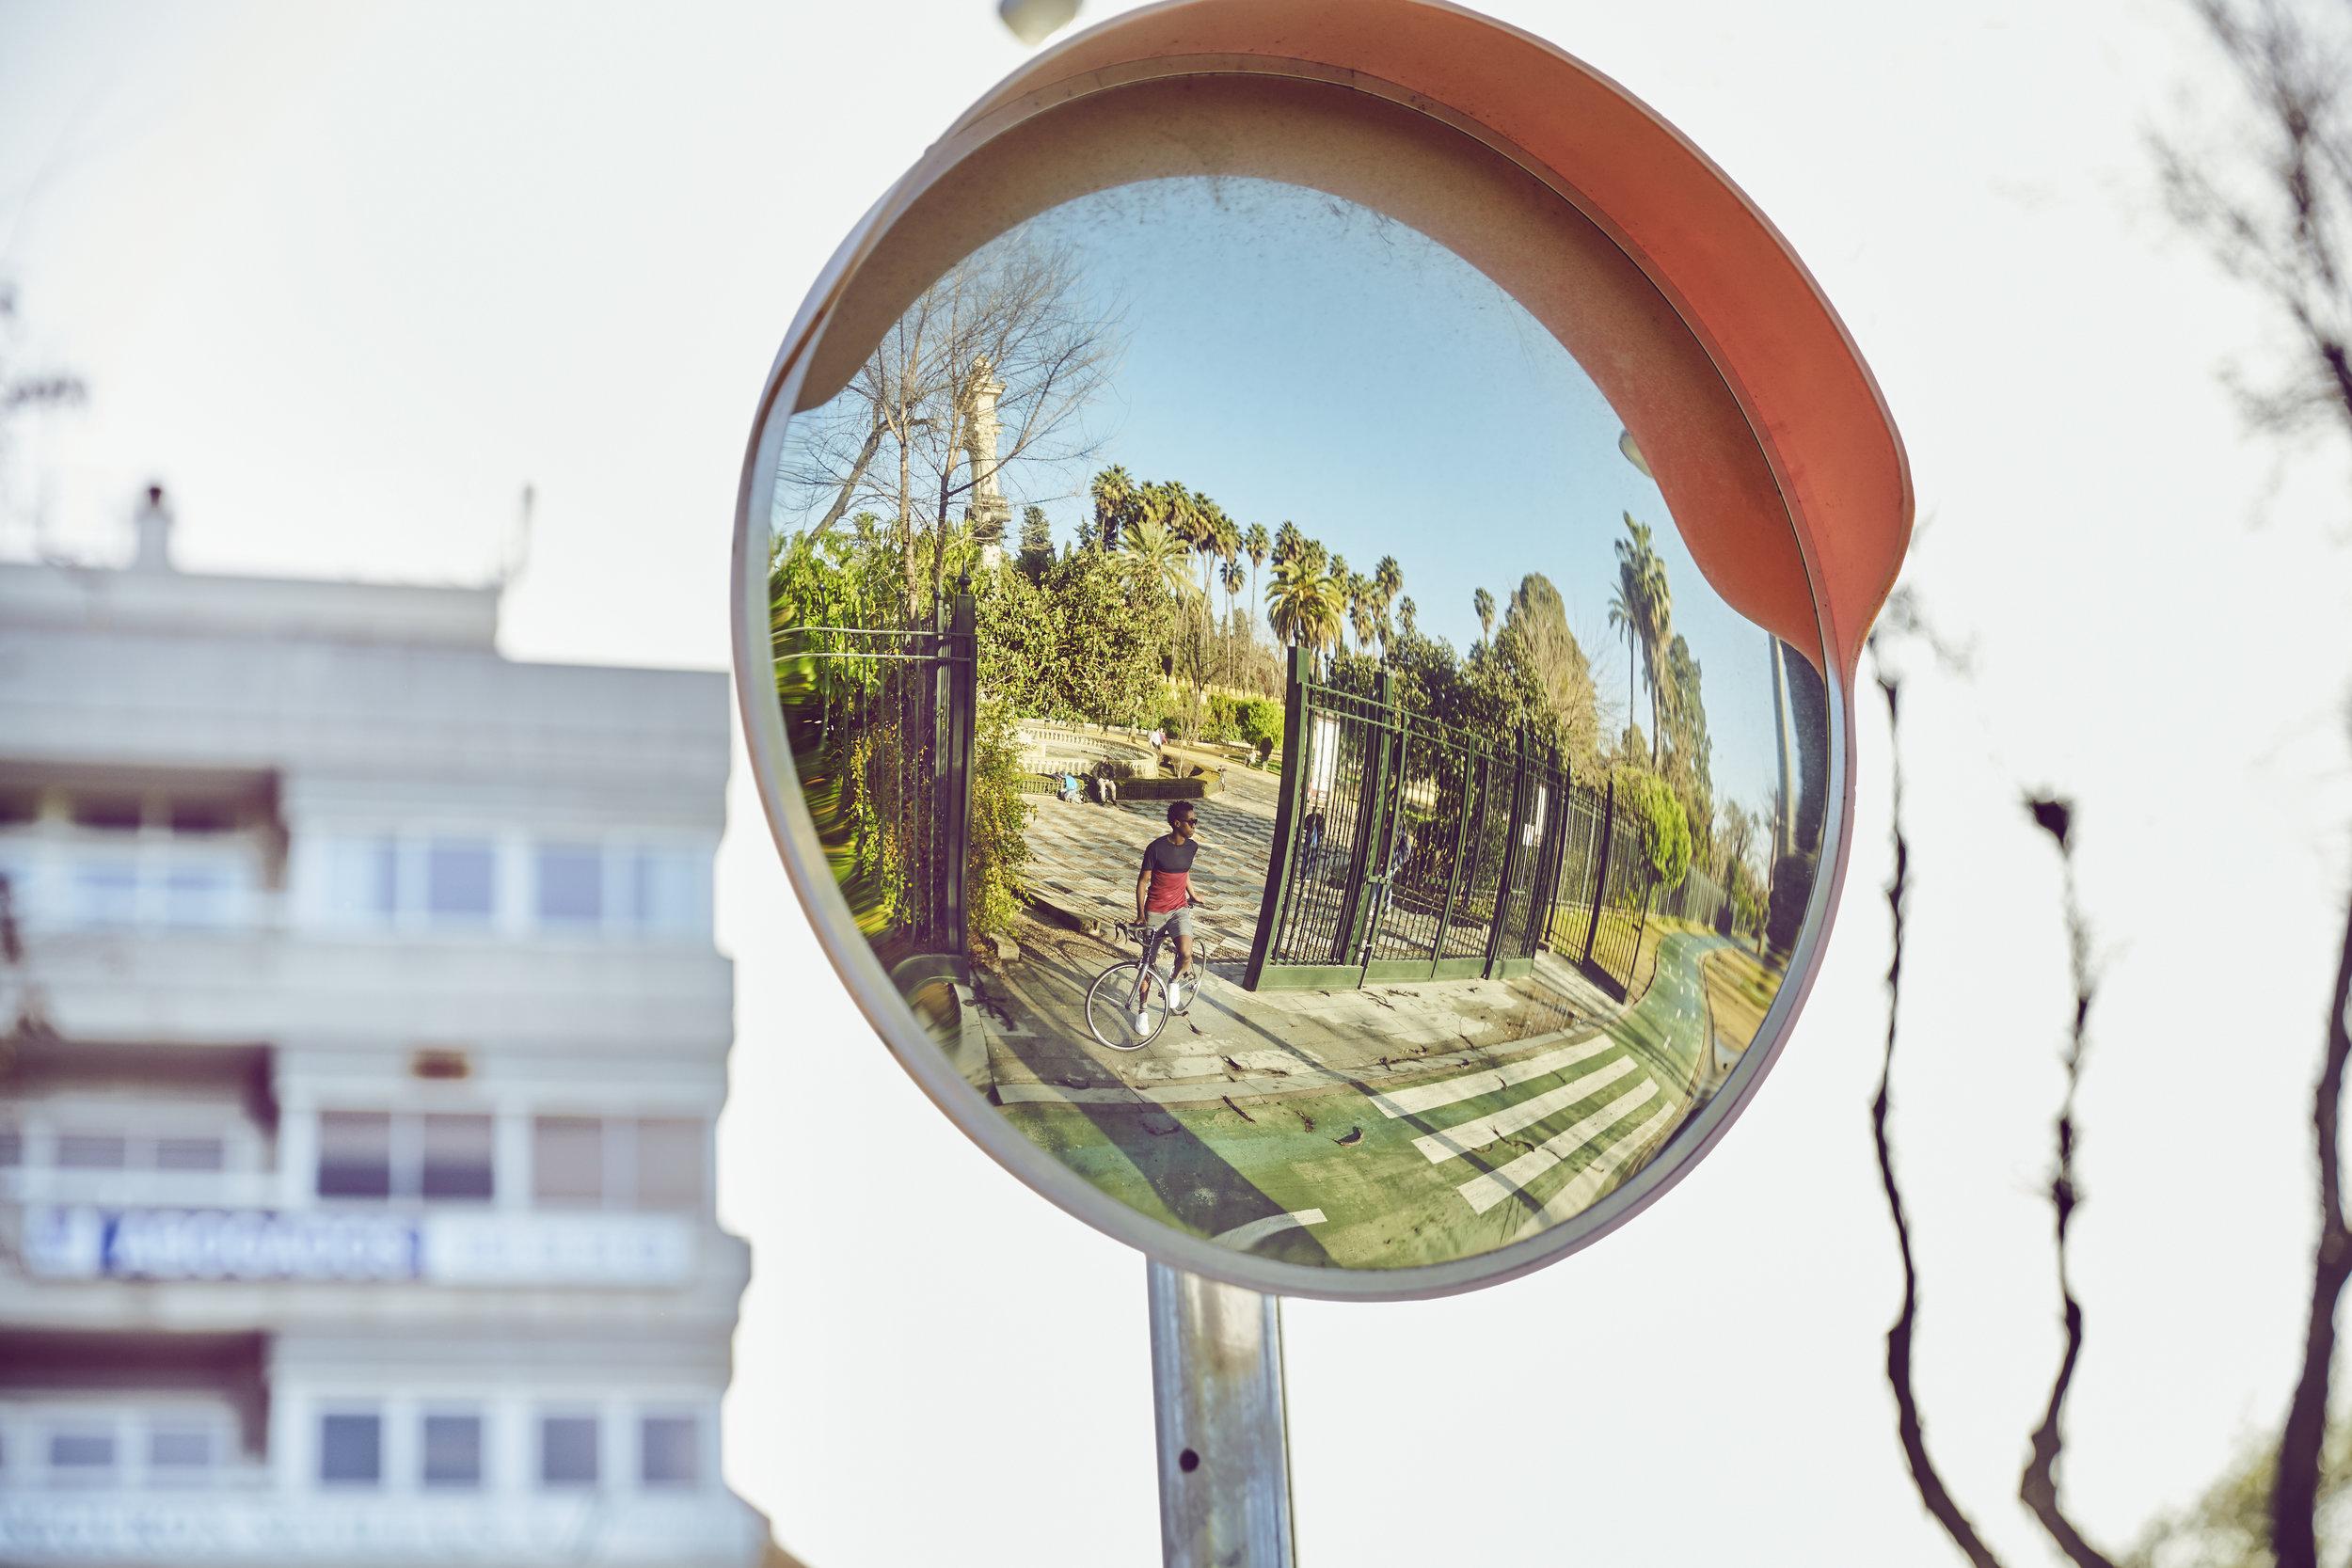 vulpine nick hussey cycling style mirror sevilla.jpg